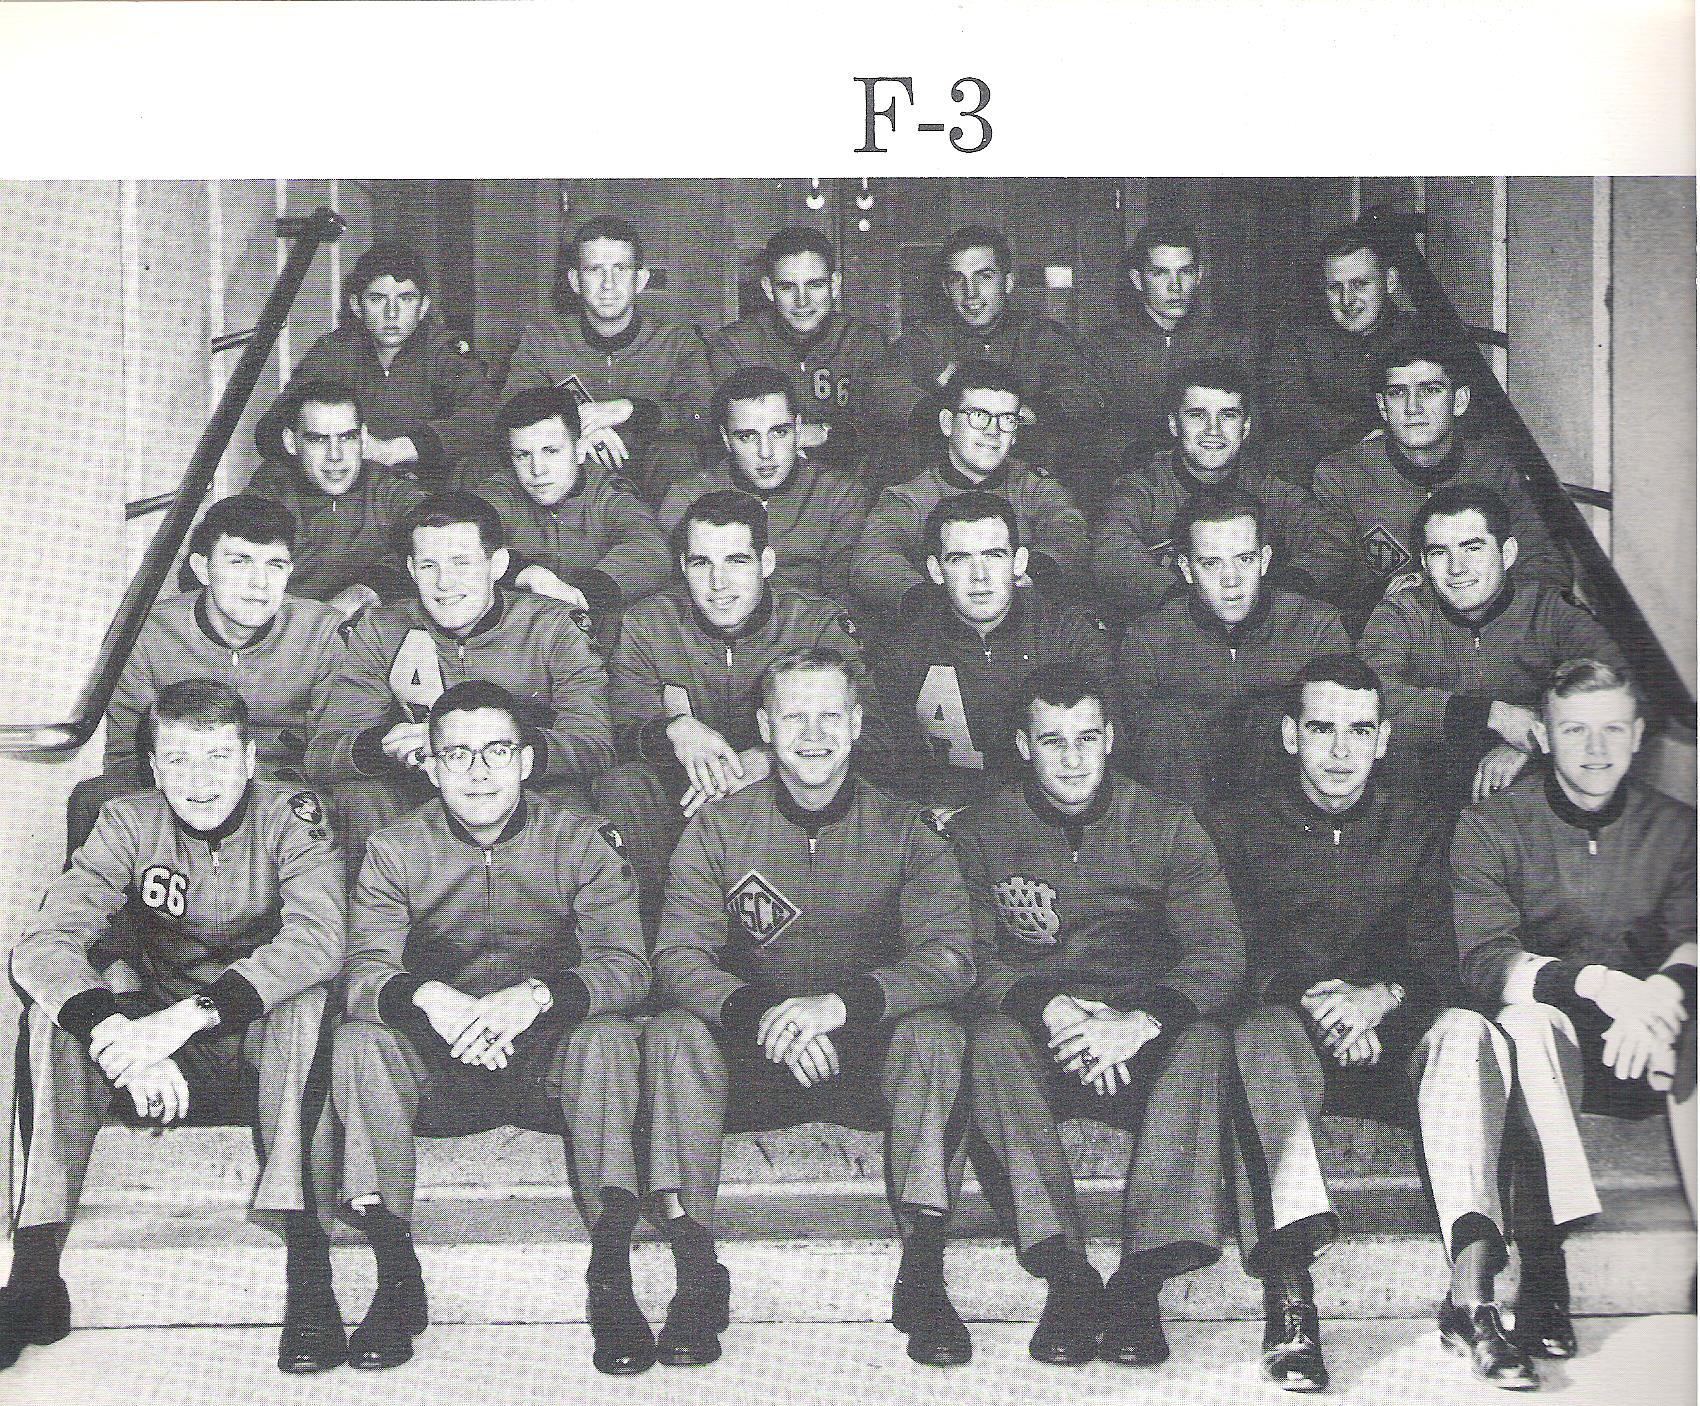 148-66F3